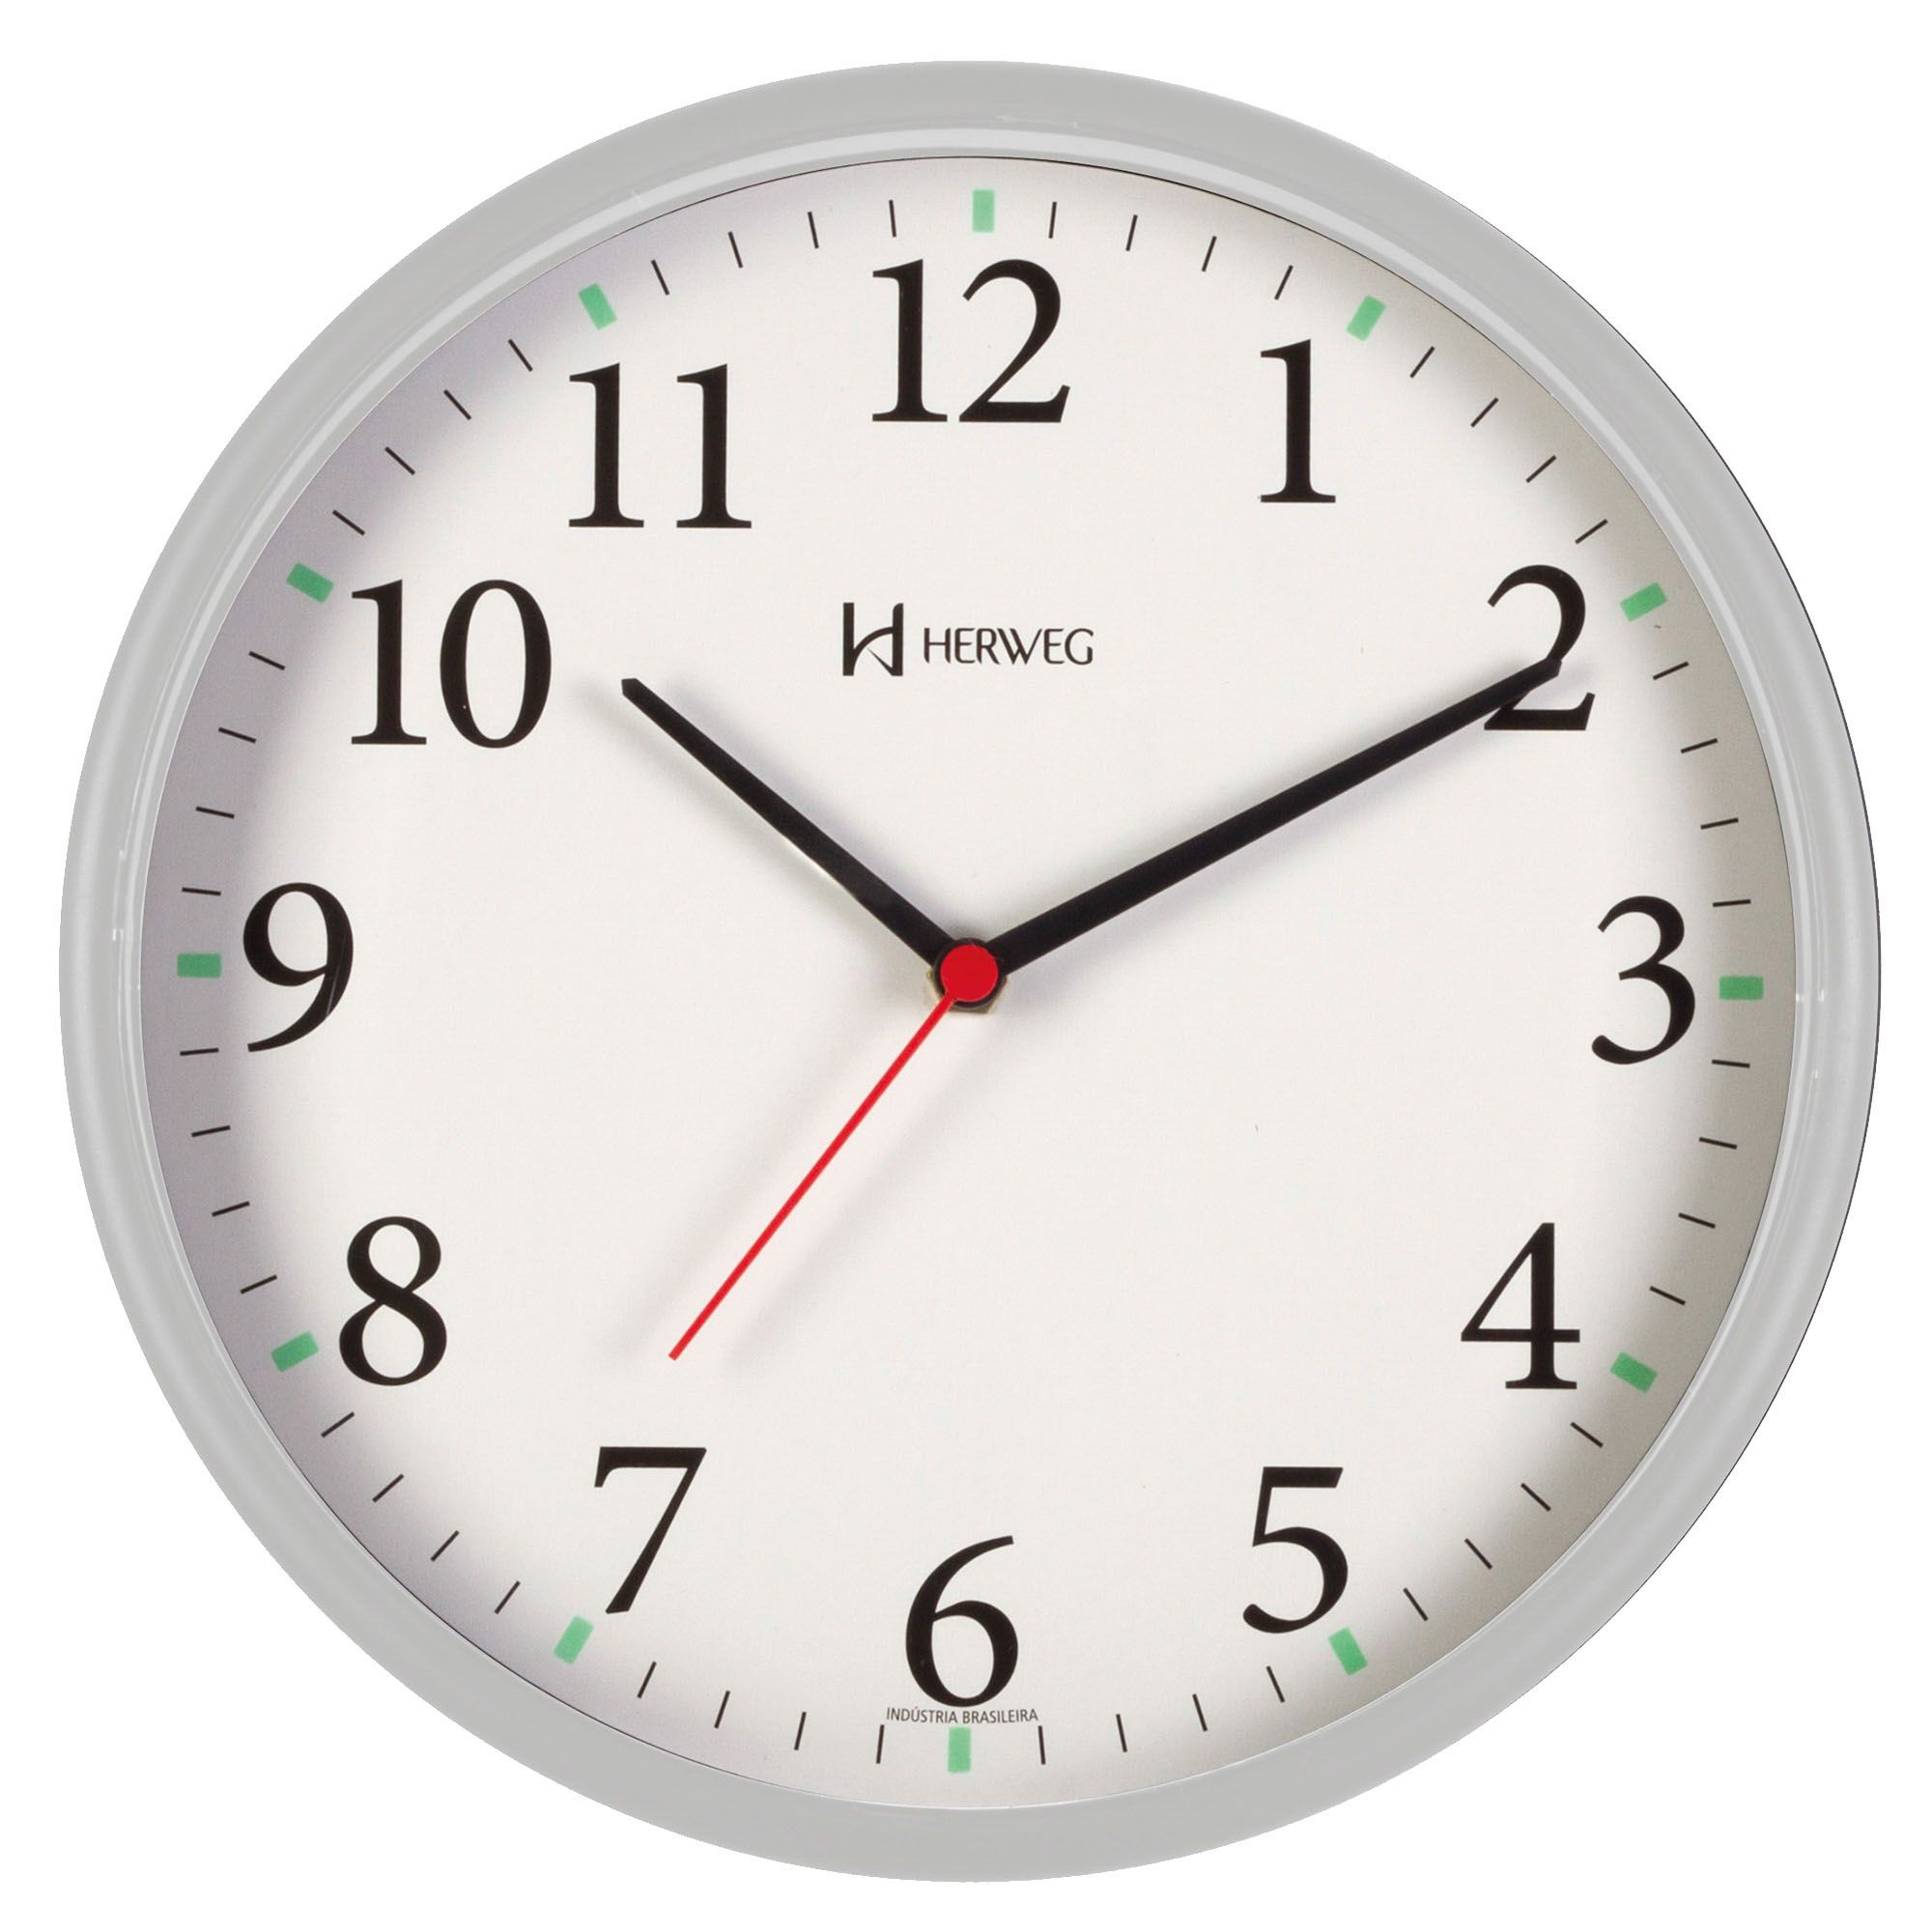 Relógio de Parede Analógico Herweg 660022 024 Cinza